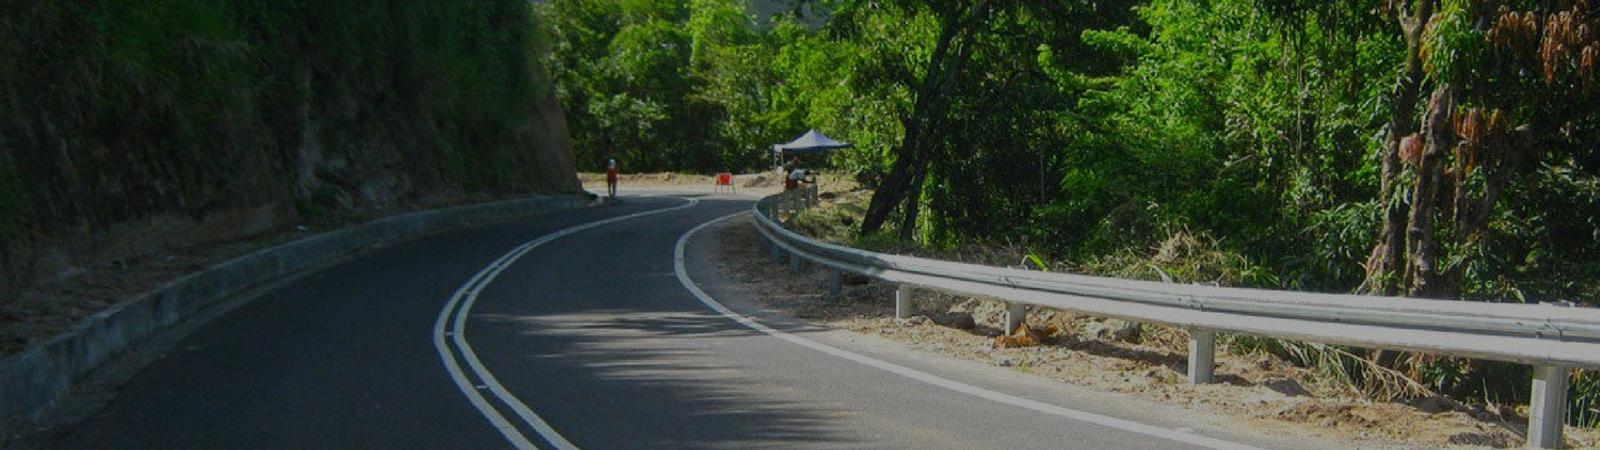 Roseau Improvement Maintenance Project